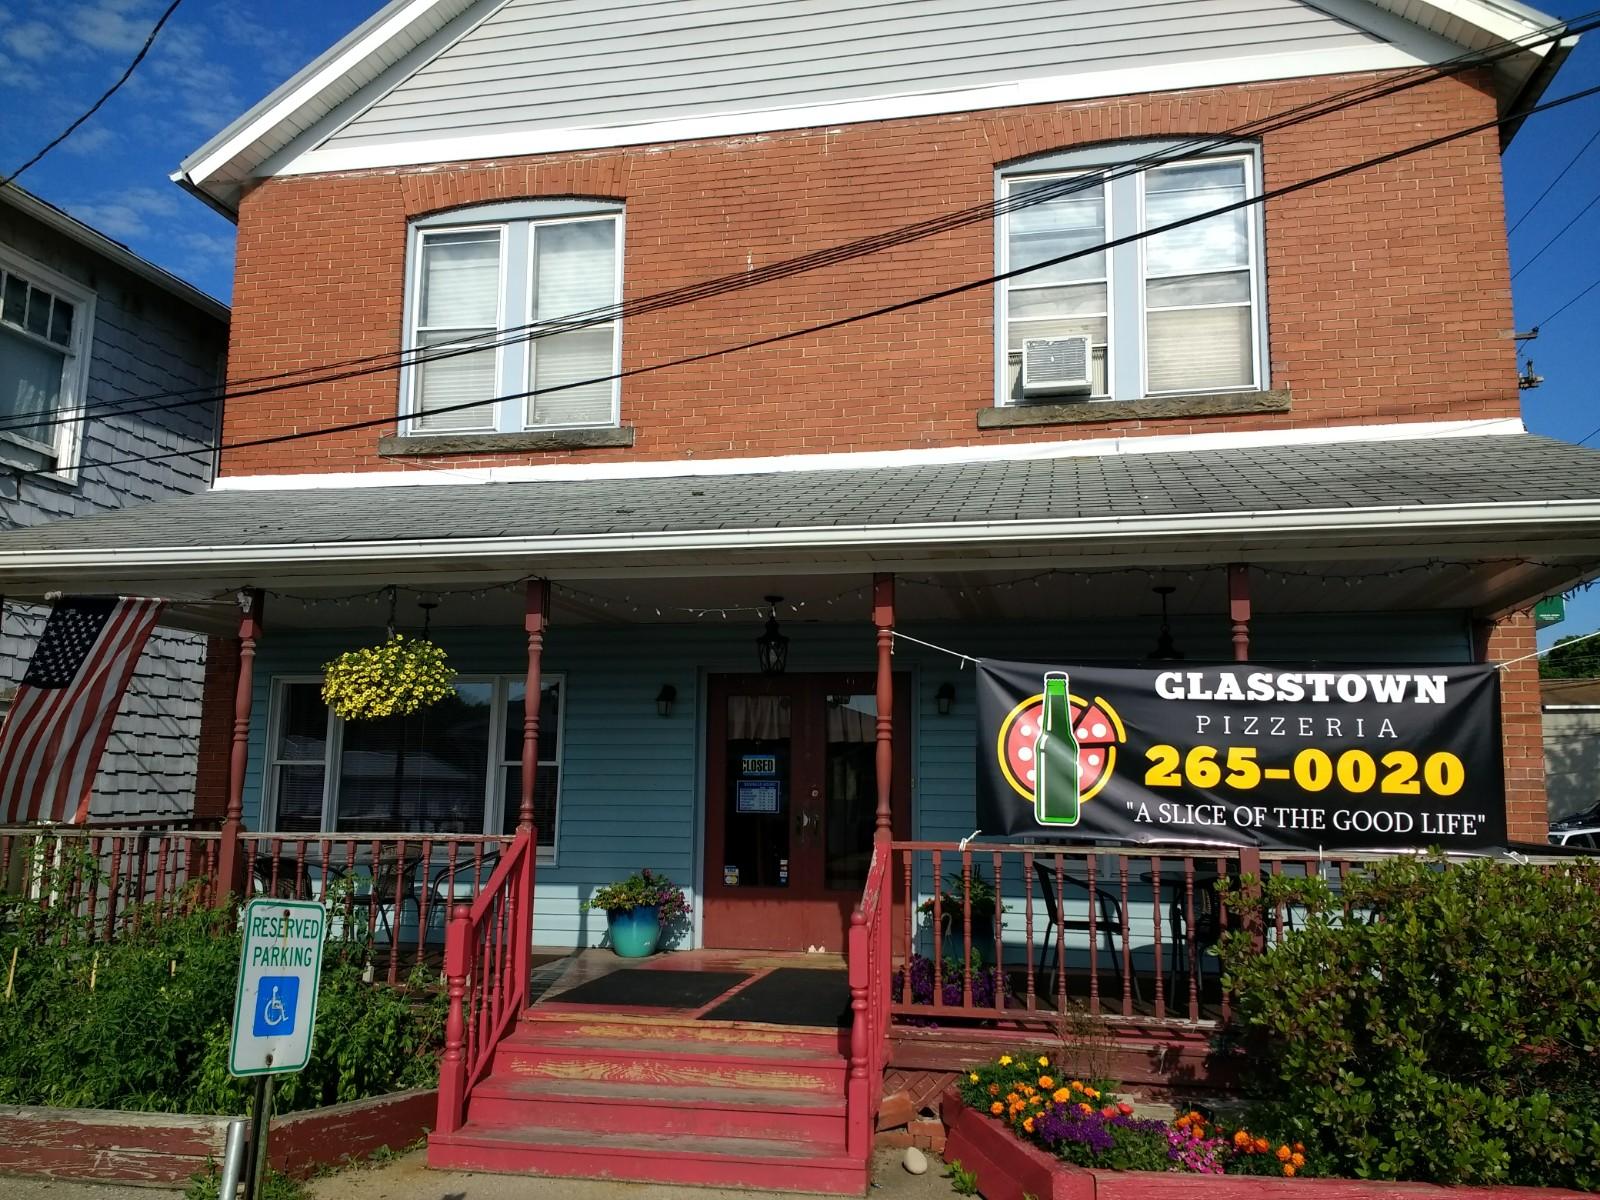 Glasstown Pizzeria